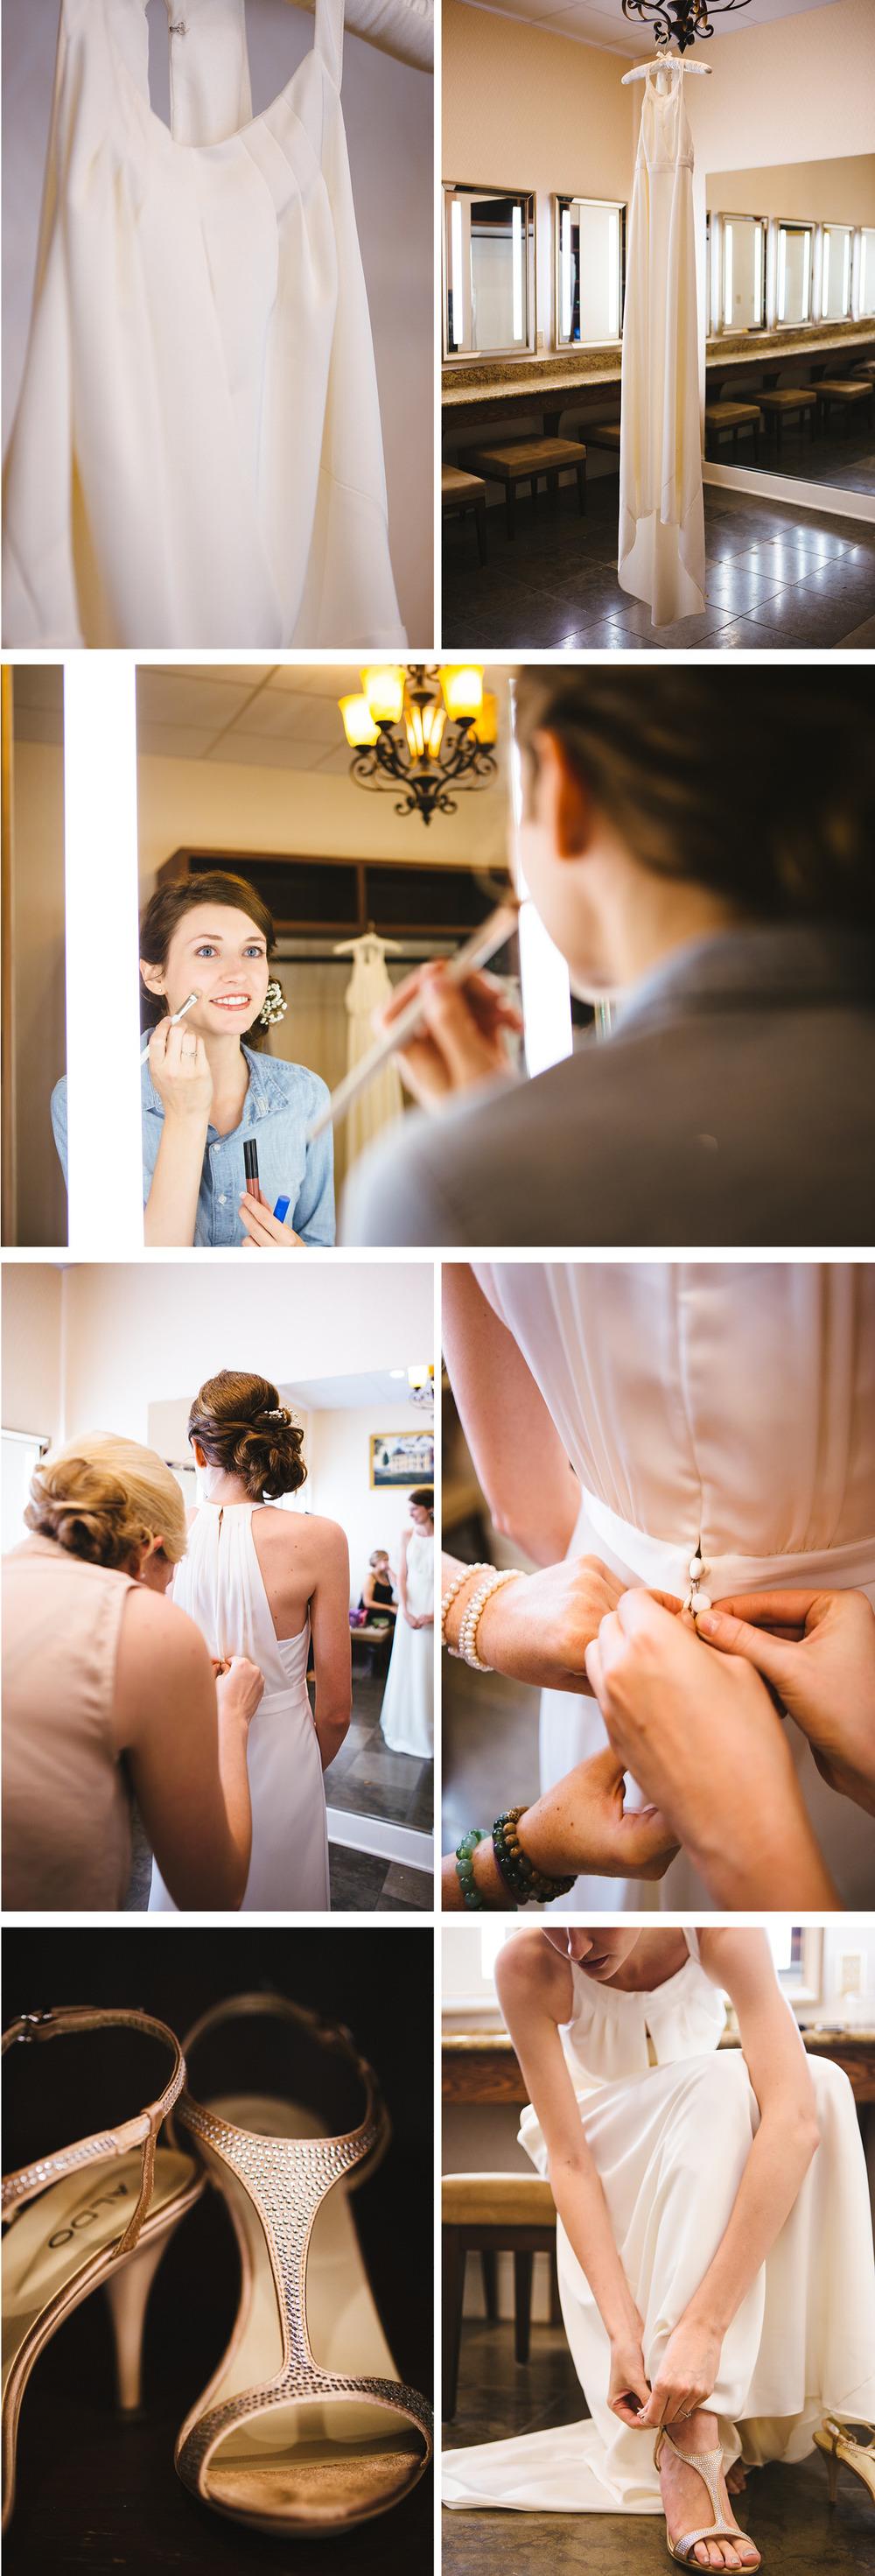 CK-Photo-Nashville-Wedding-Photographer-TN2.jpg